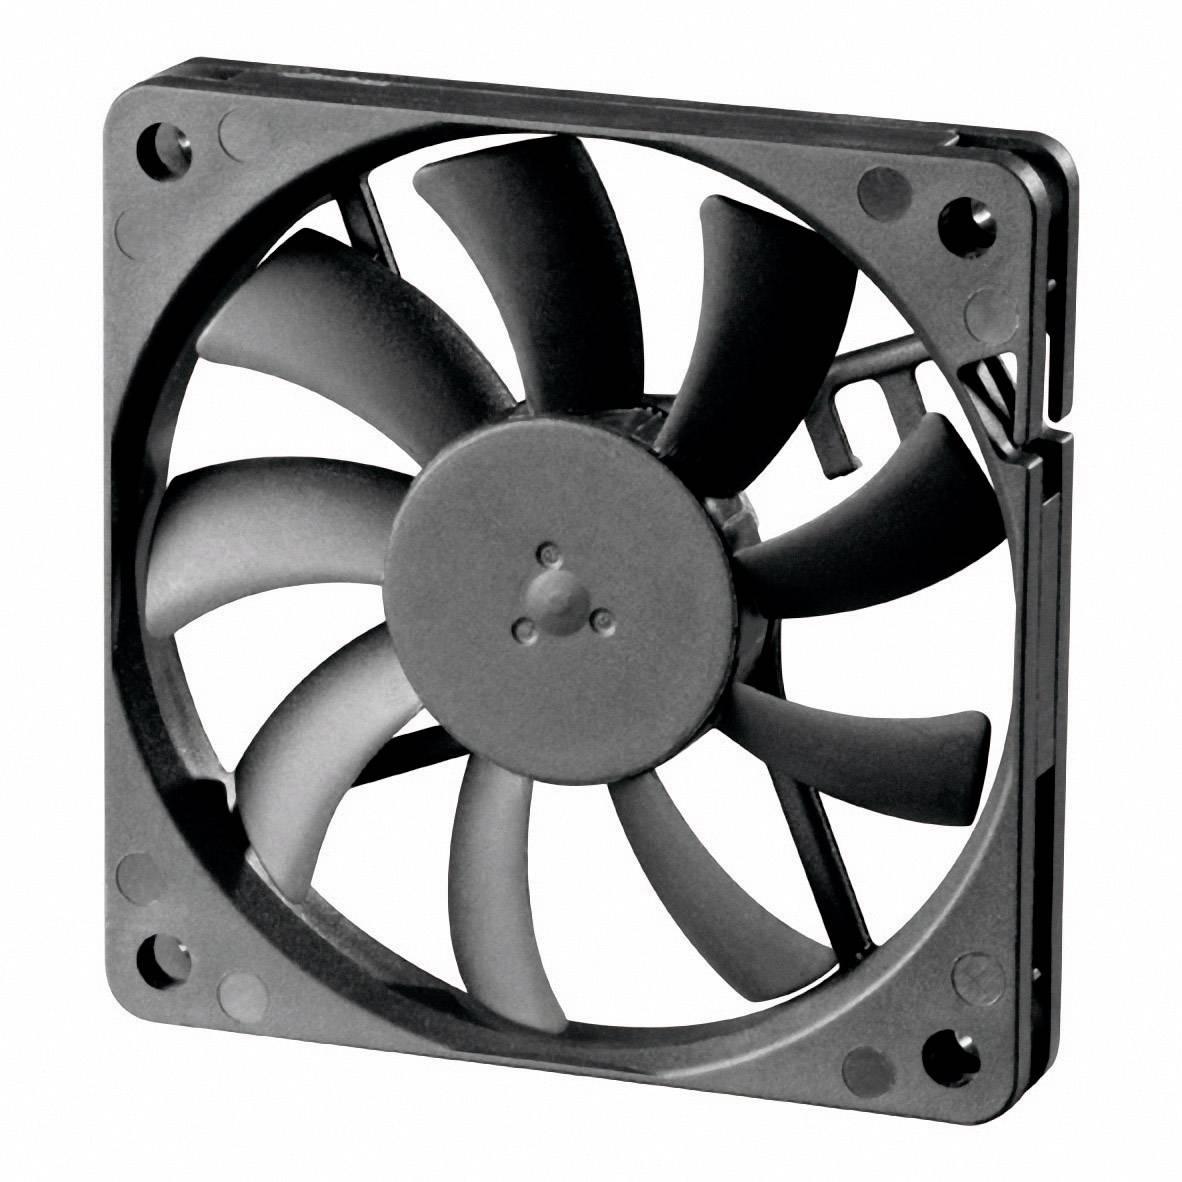 Axiálny ventilátor Sunon MB70101V2-0000-A99 MB70101V2-0000-A99, 12 V/DC, 24.5 dB, (d x š x v) 70 x 70 x 10 mm